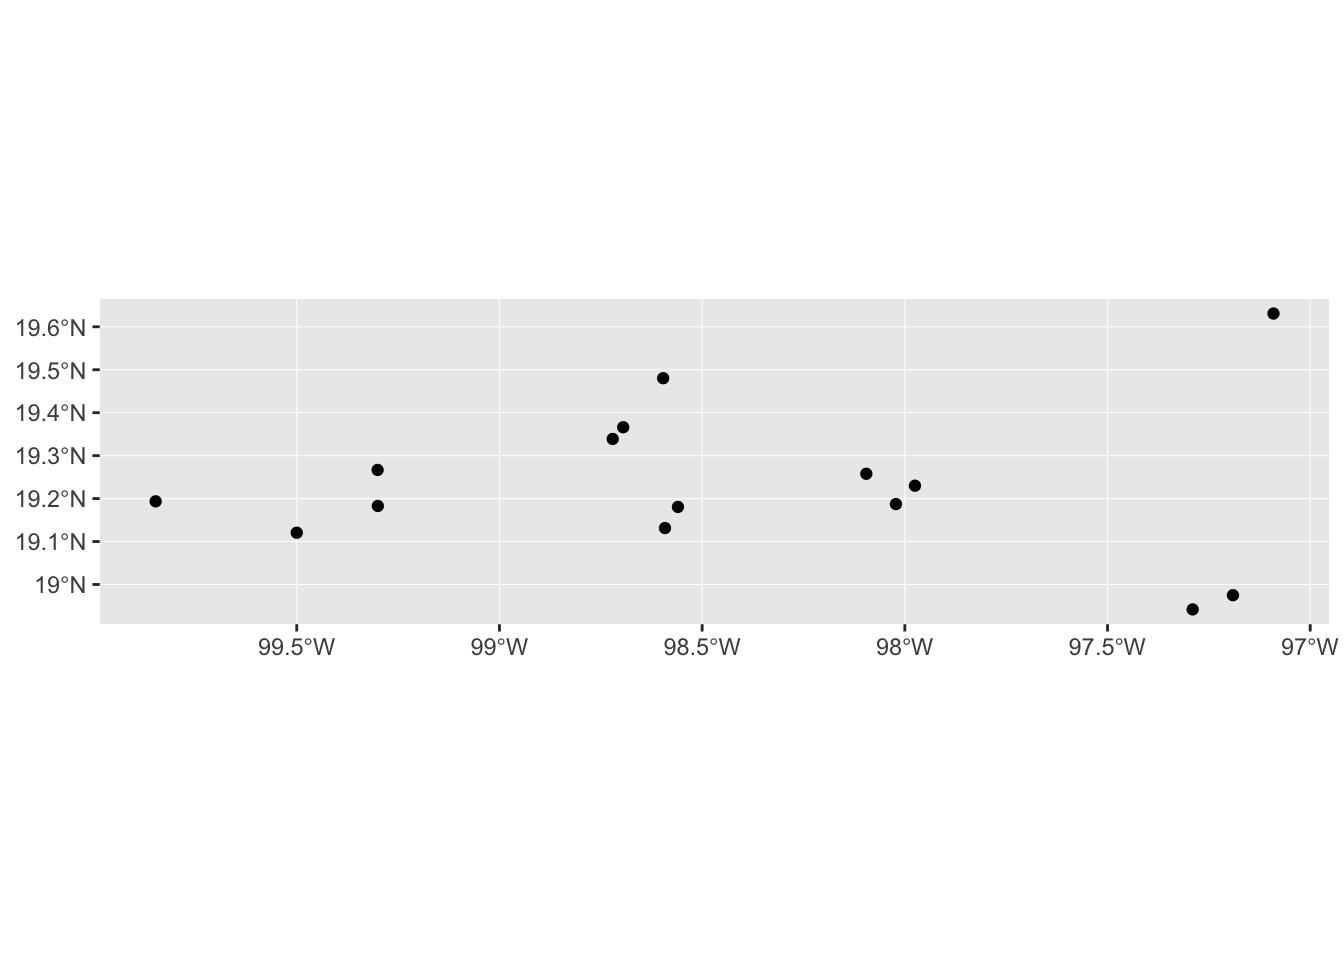 Vector spatial data